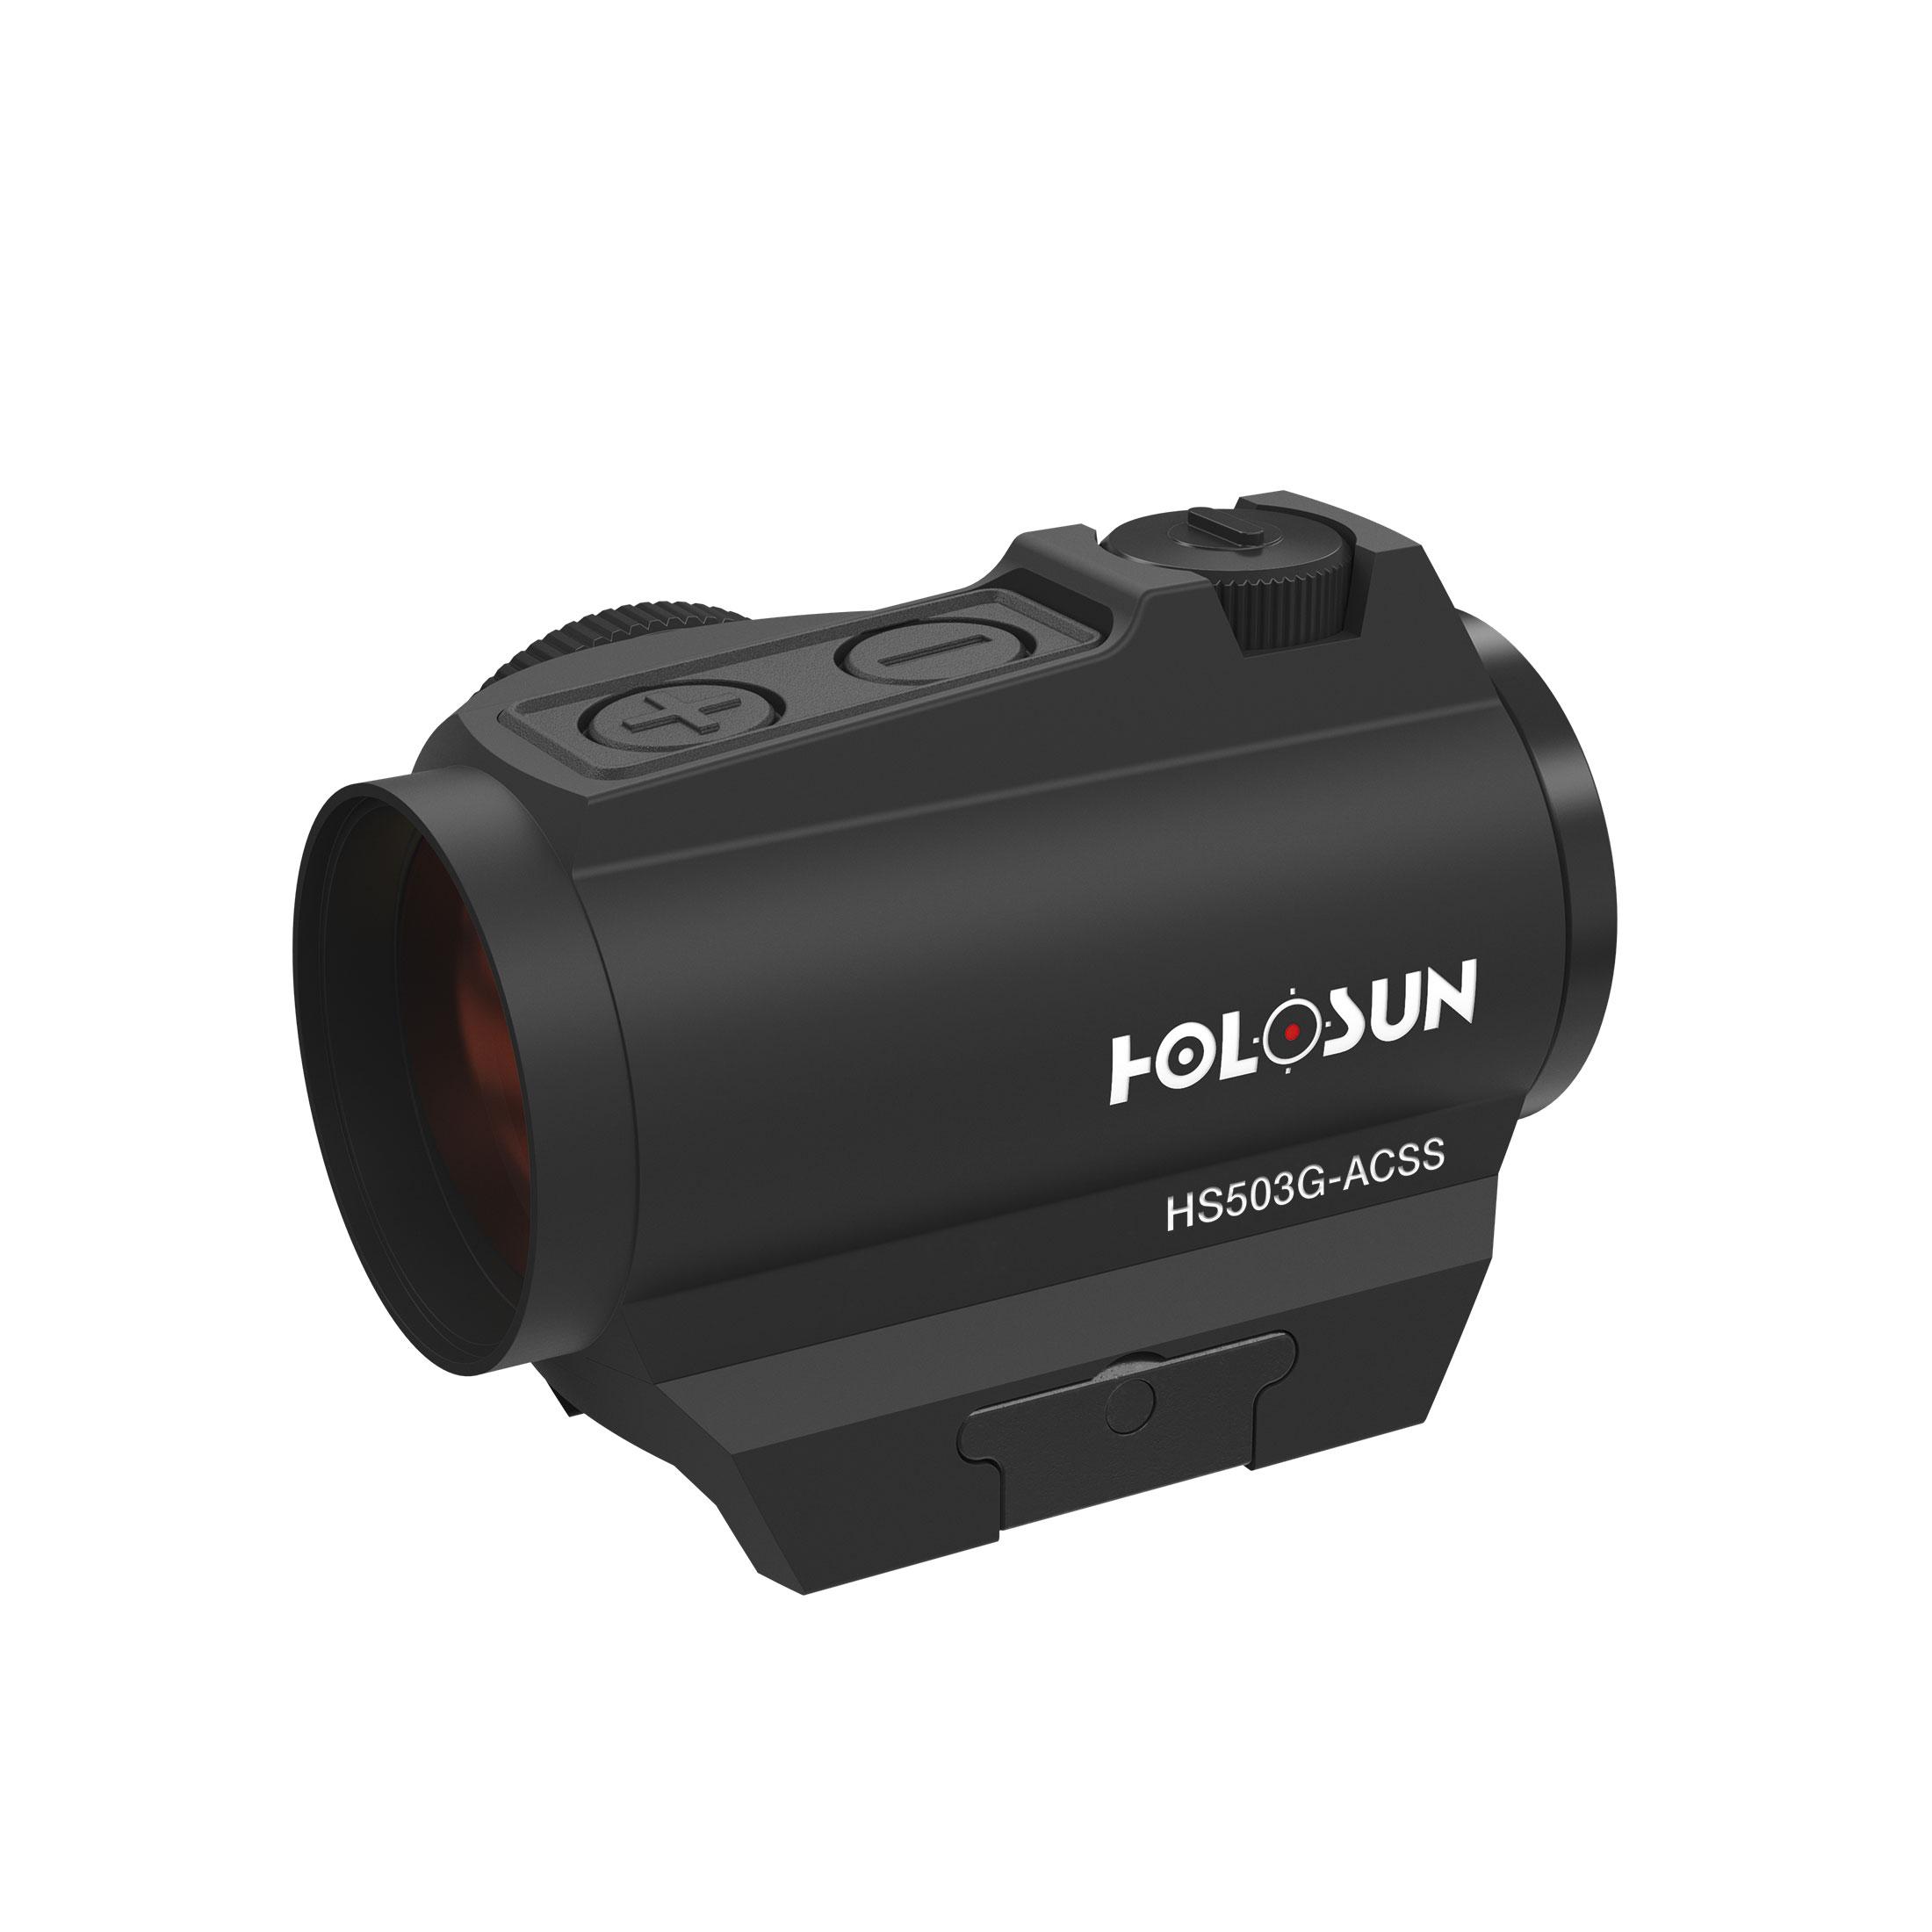 Holosun CLASSIC HS503G-ACSS